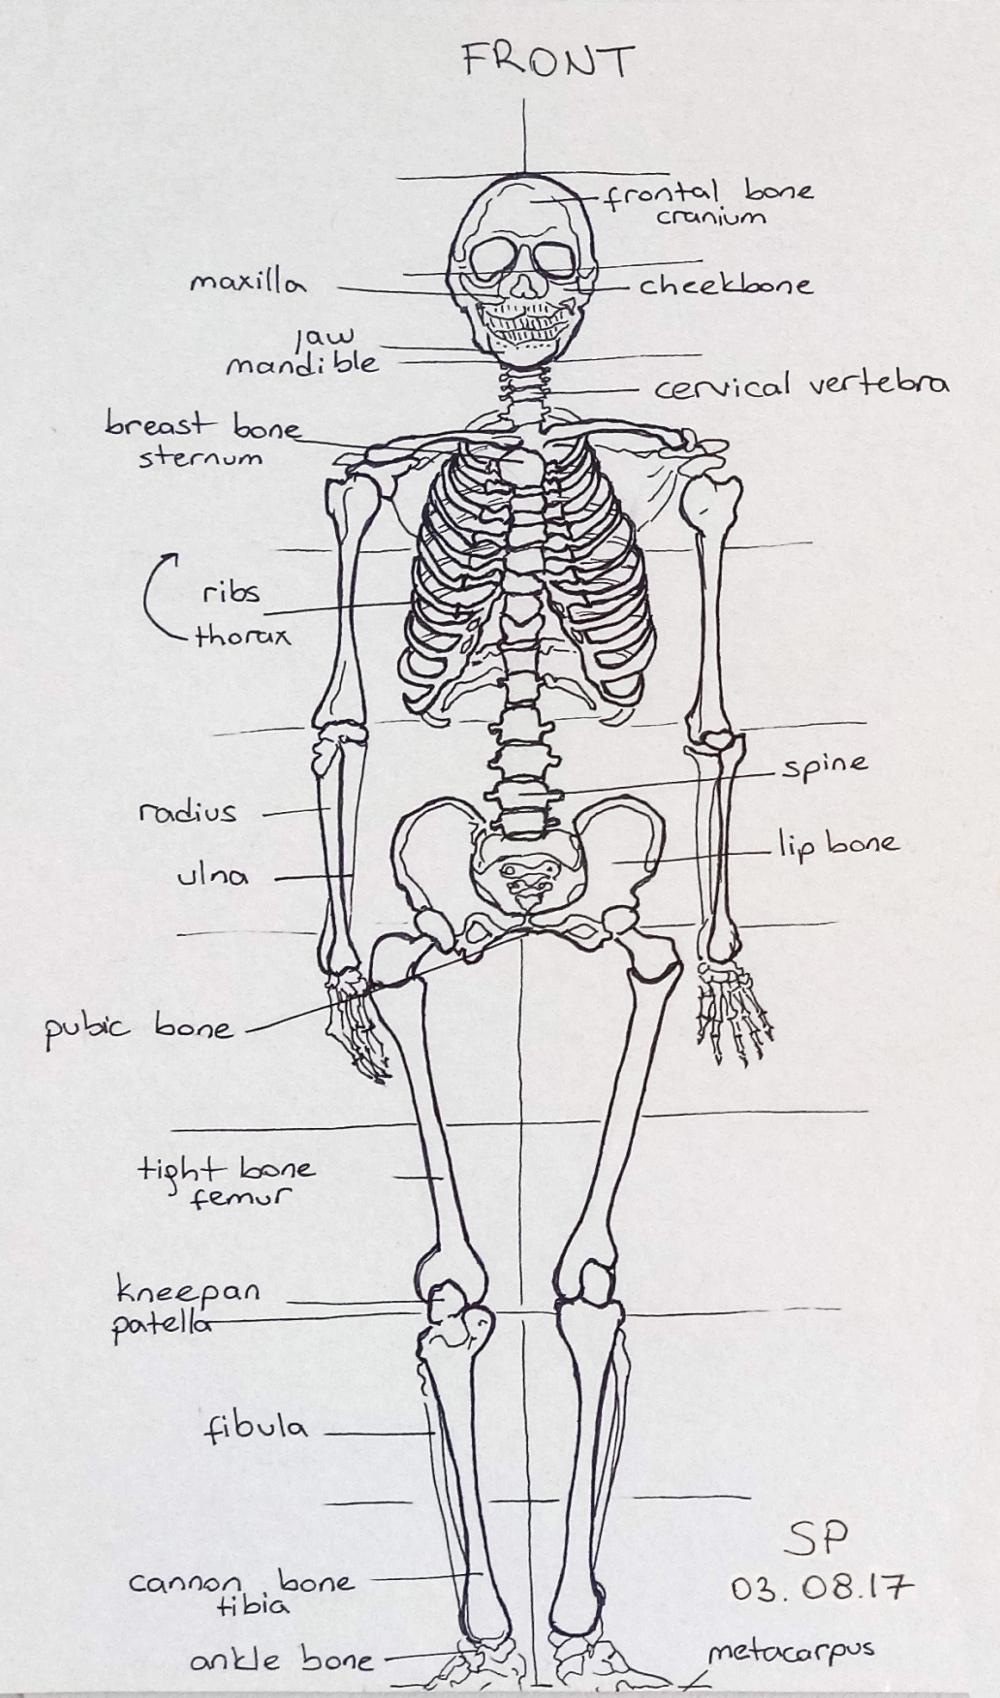 skeleton drawing front